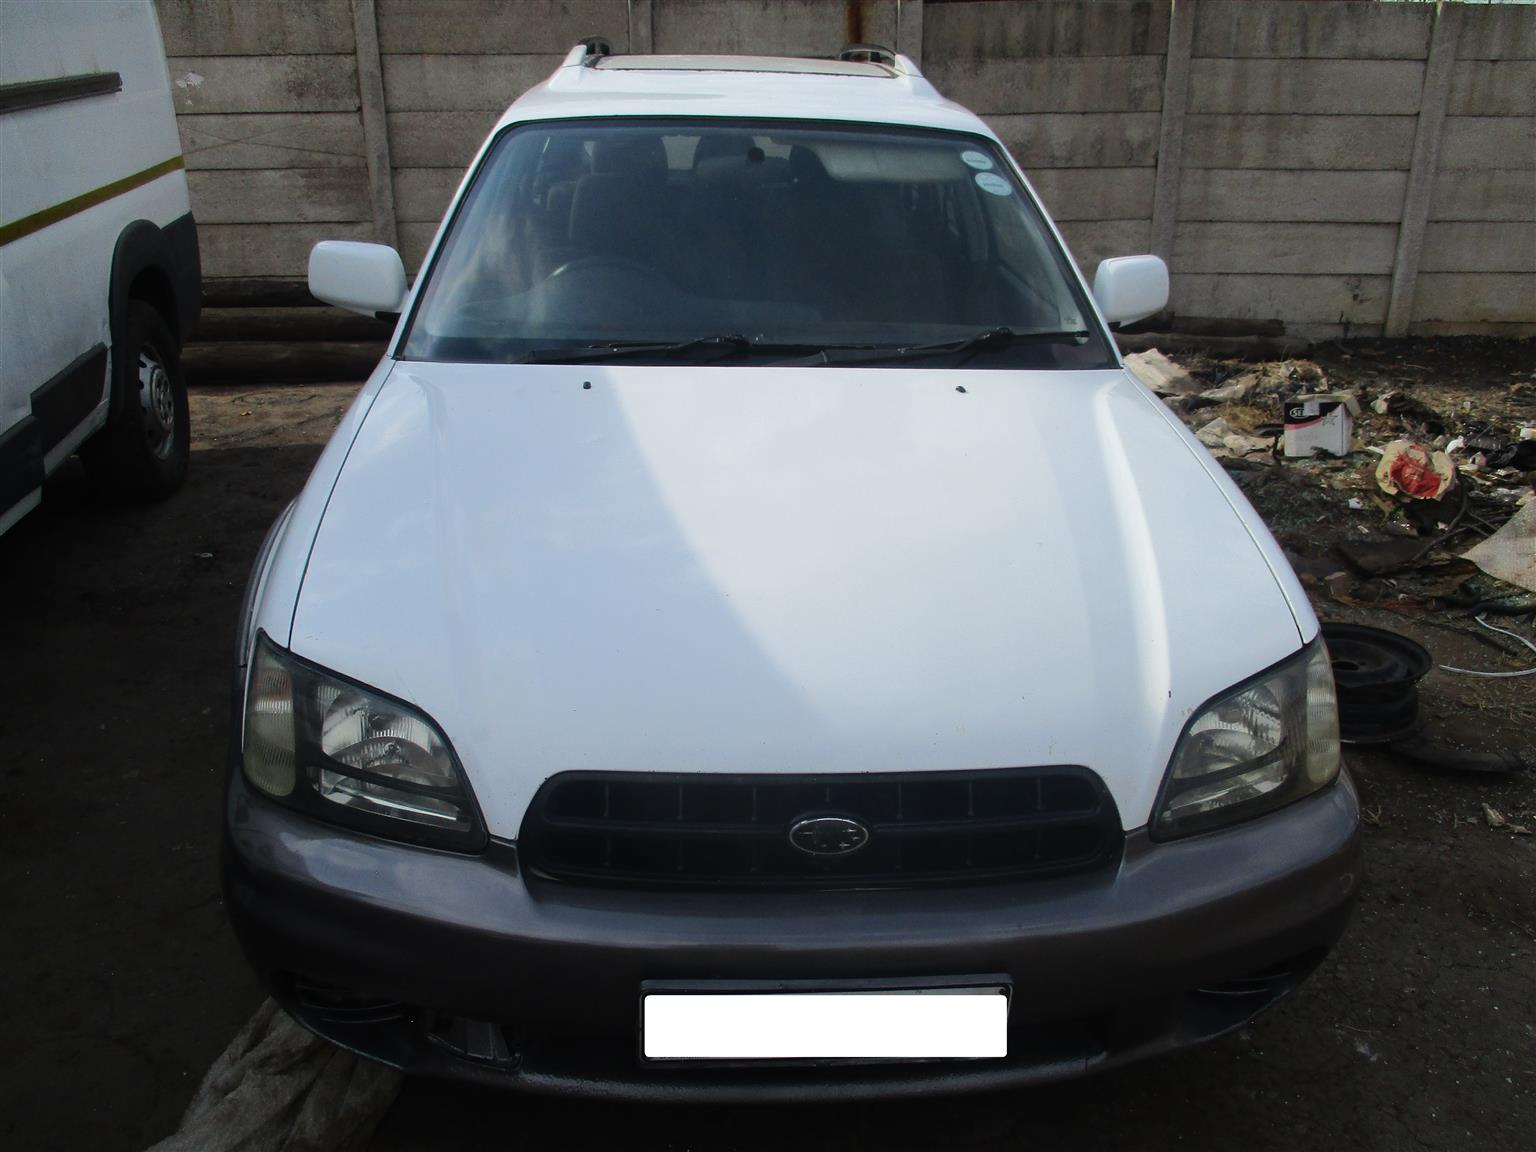 2007 Subaru Outback OUTBACK 2.5 IS ES CVT